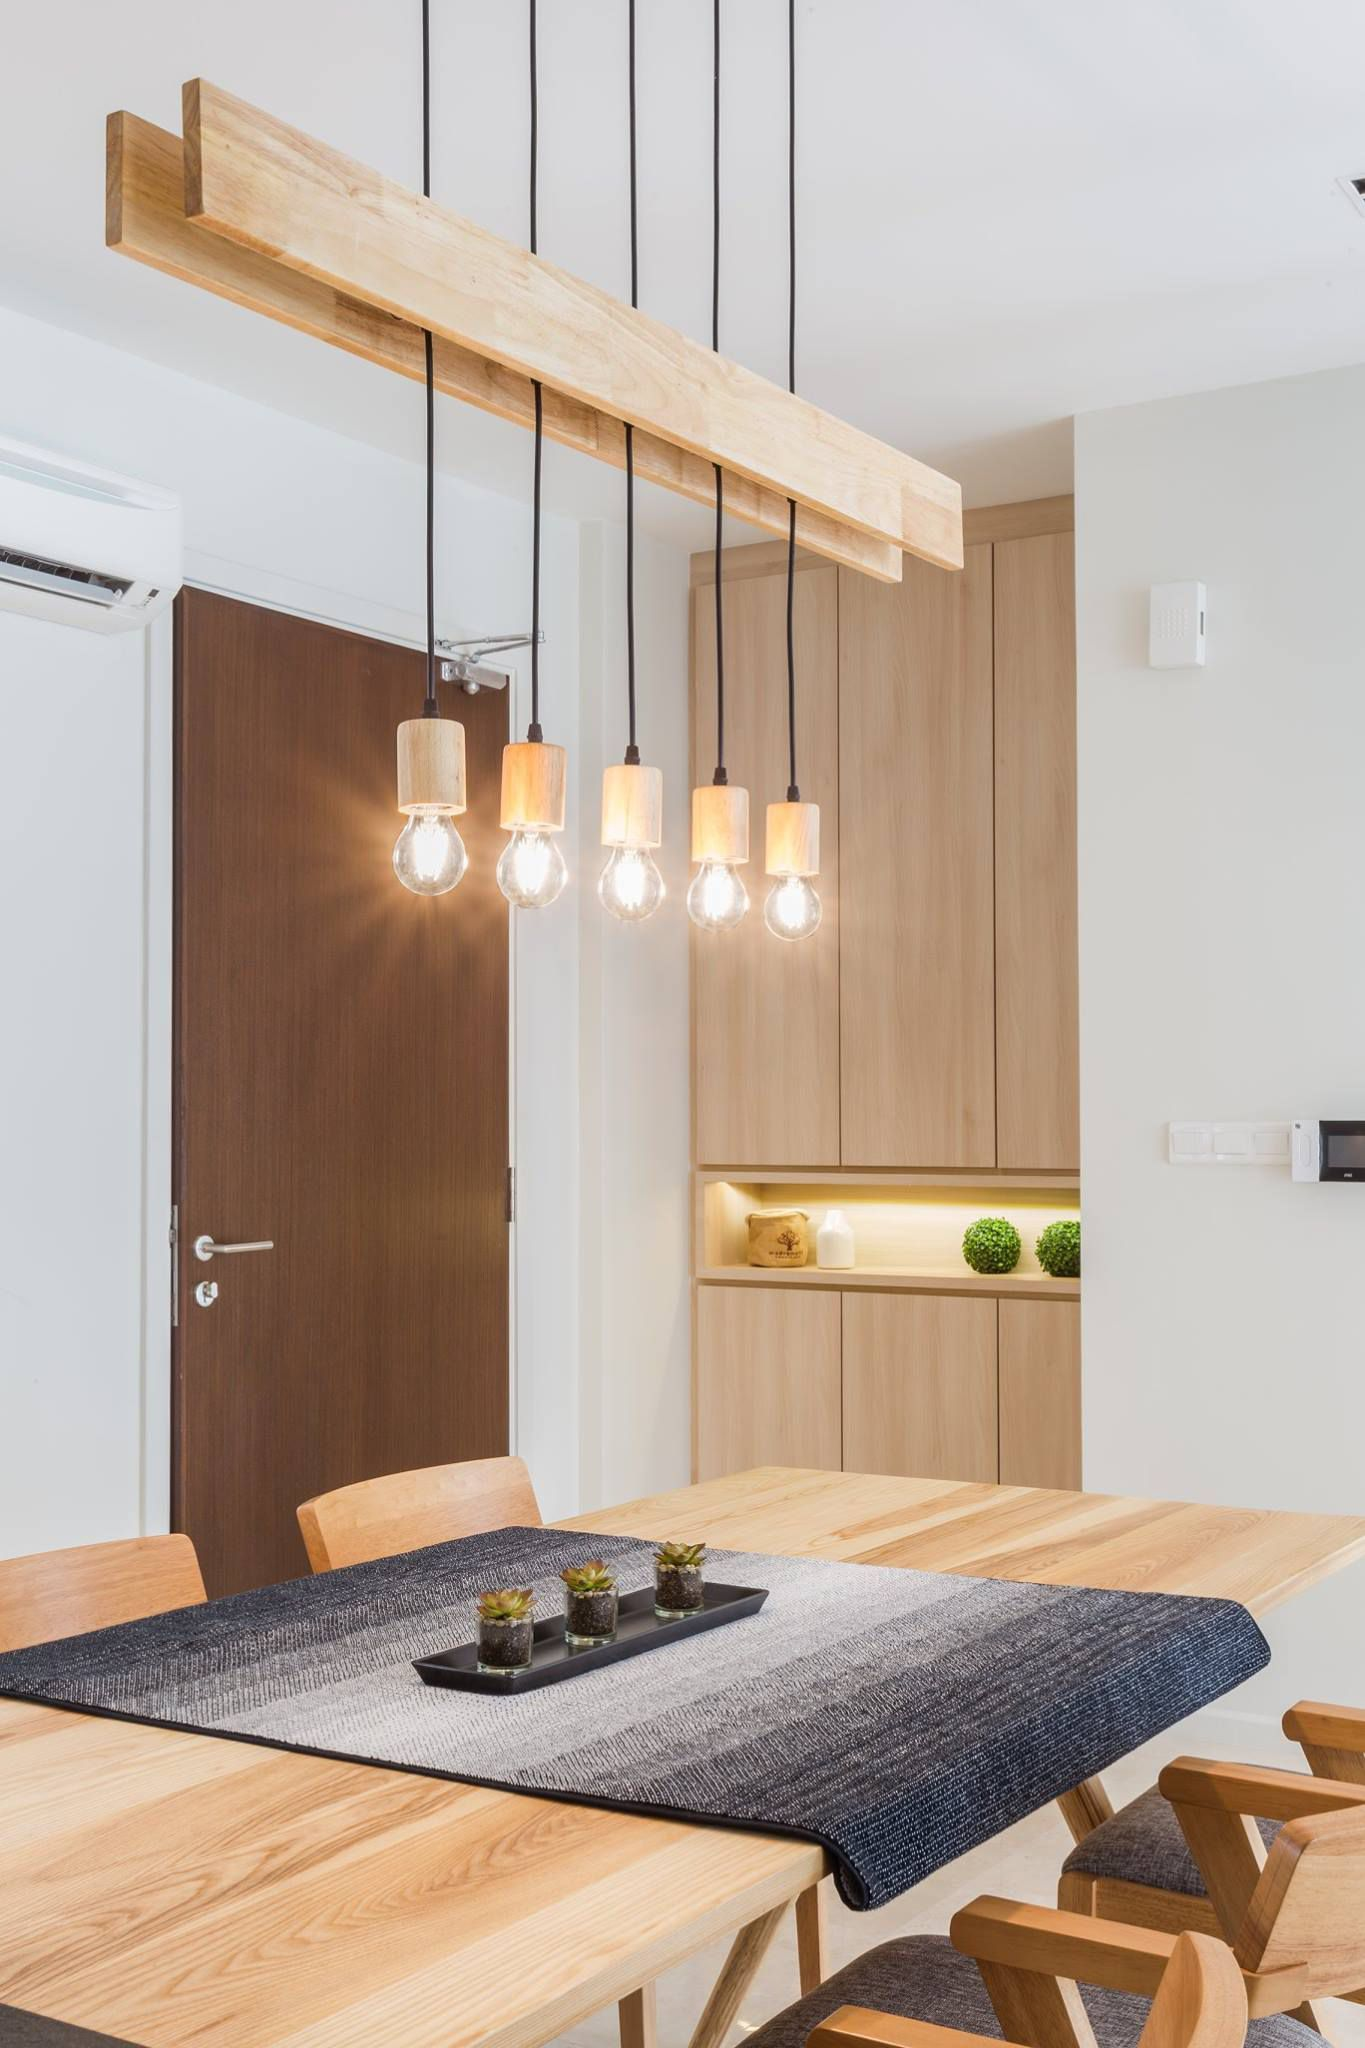 Stunning Wooden Light Fixture Hangs Over The Dining Area Wooden Light Fixtures Lighting Design Interior Wooden Lamps Design